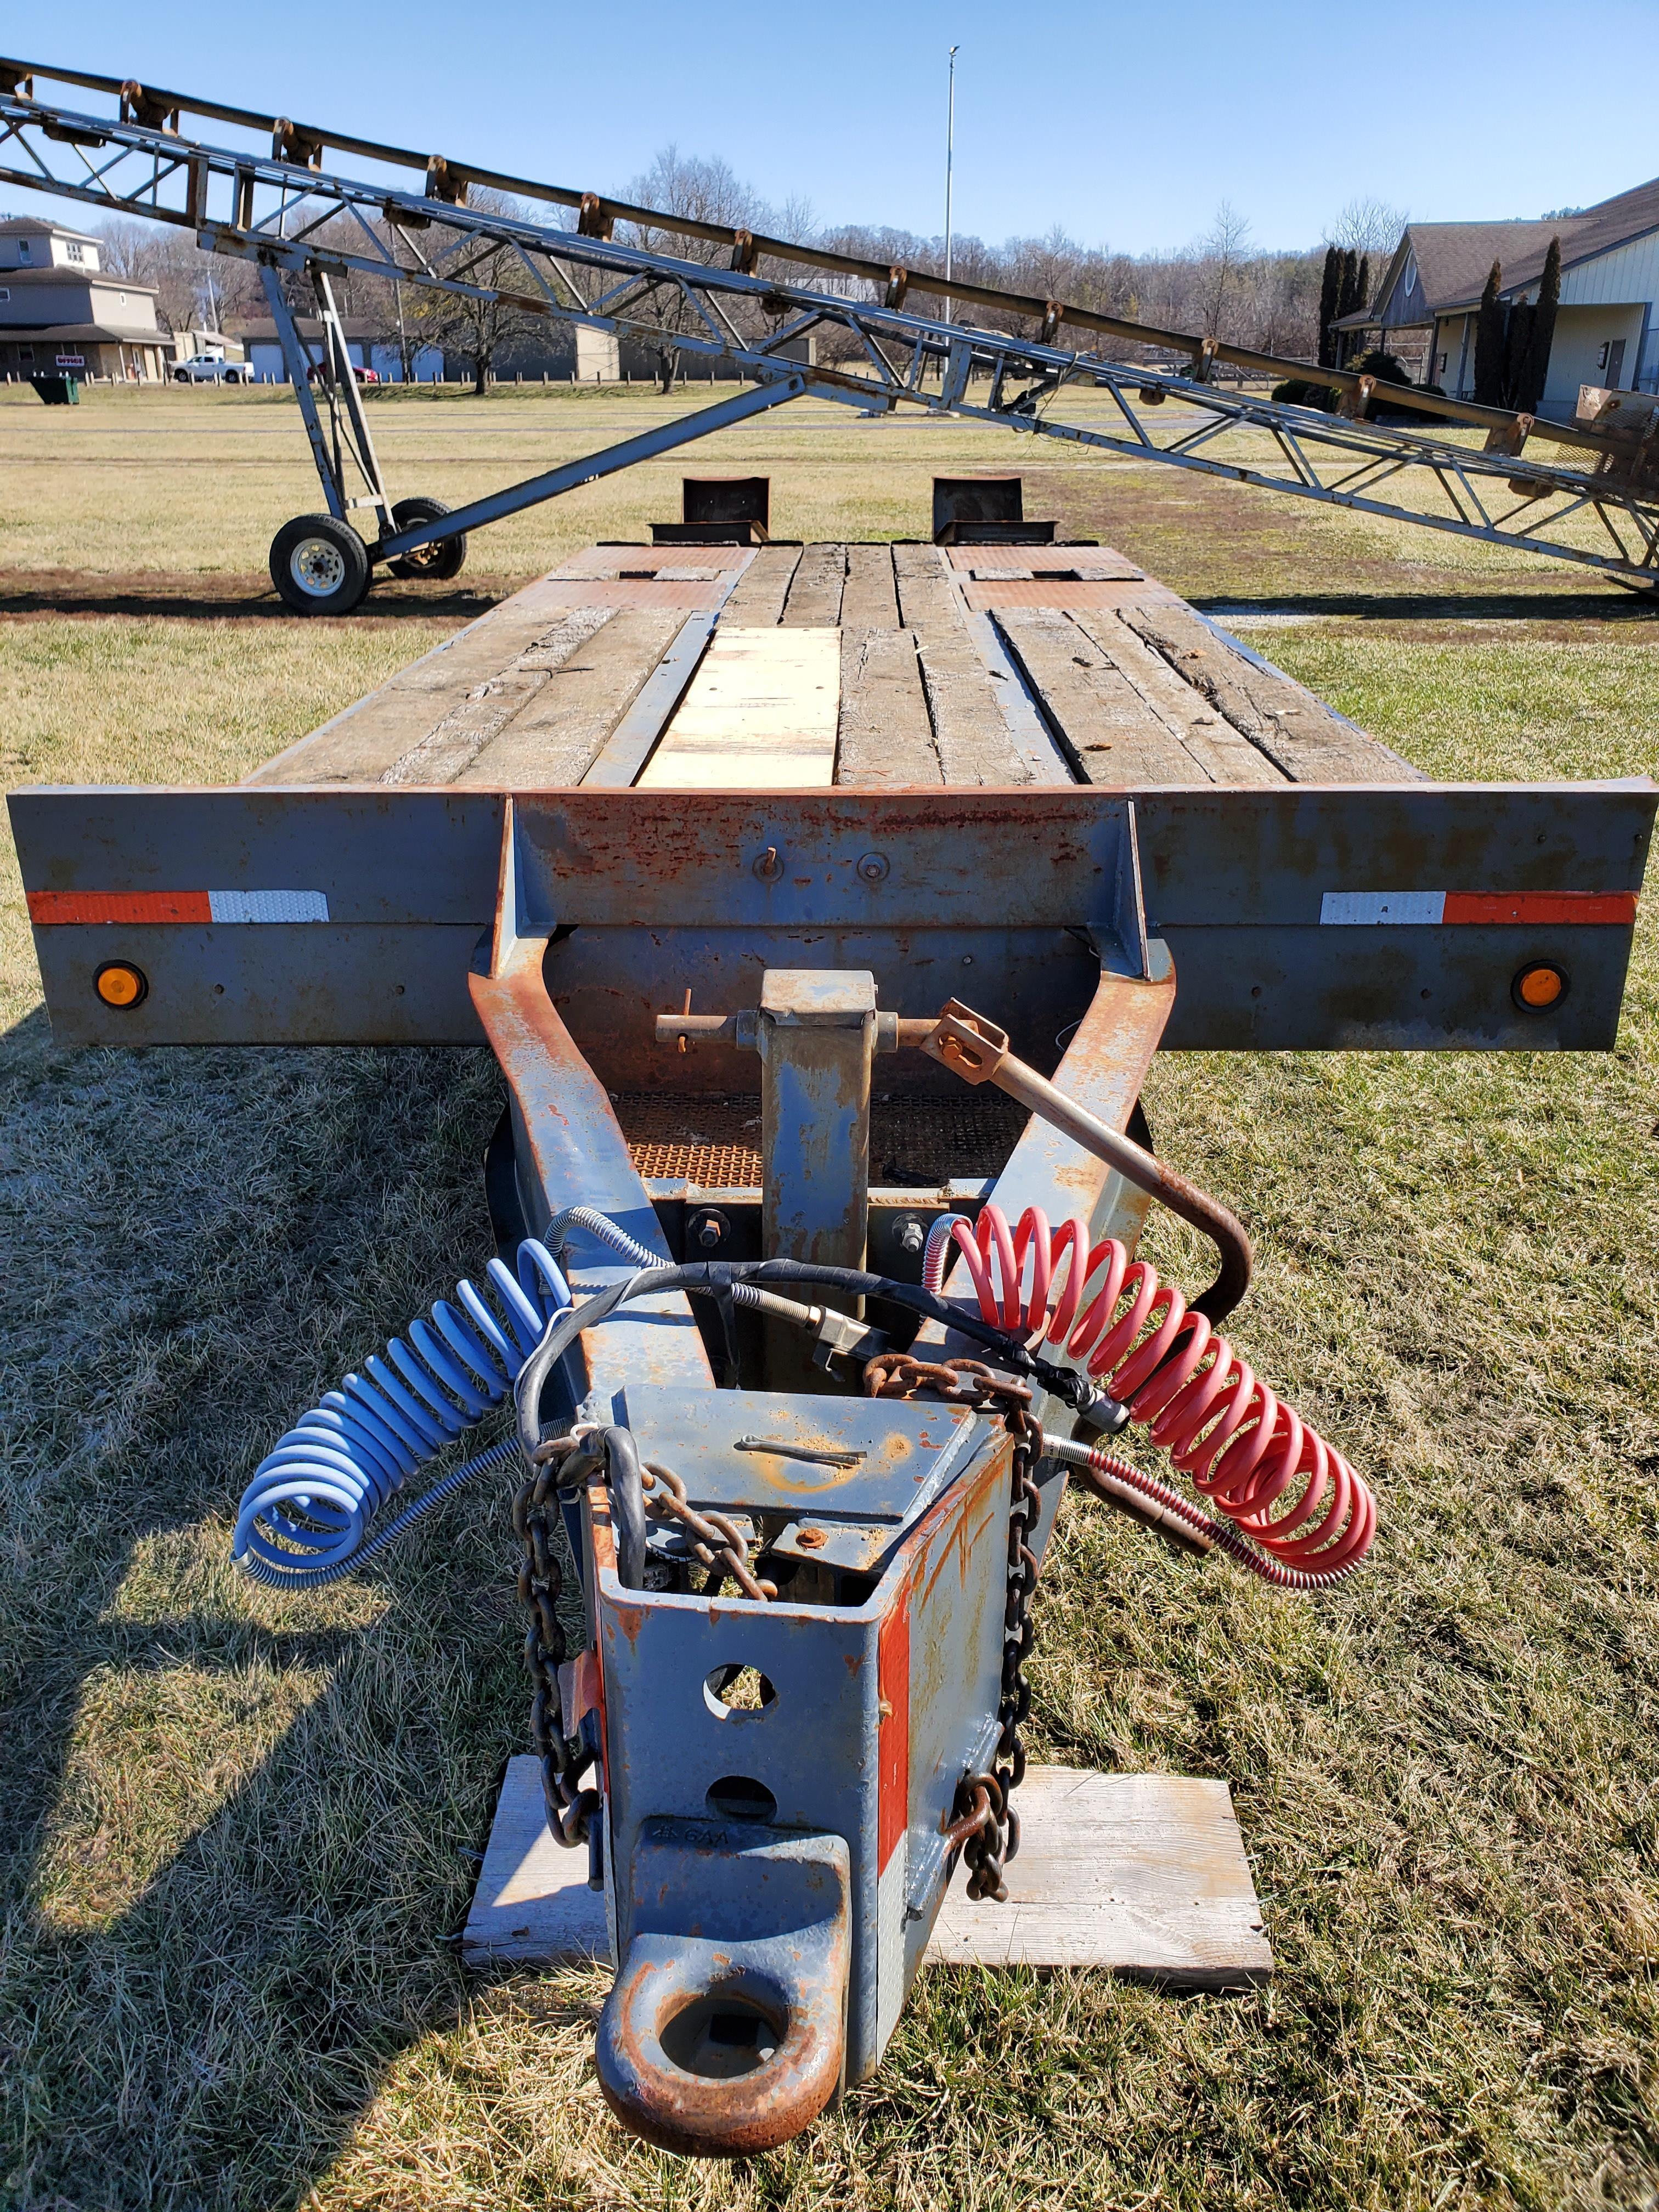 Eager Beaver Model 10HA Equipment Trailer 19 ft. Main Deck w/5 ft Beaver-tail x 81 in Wide, - Image 7 of 8